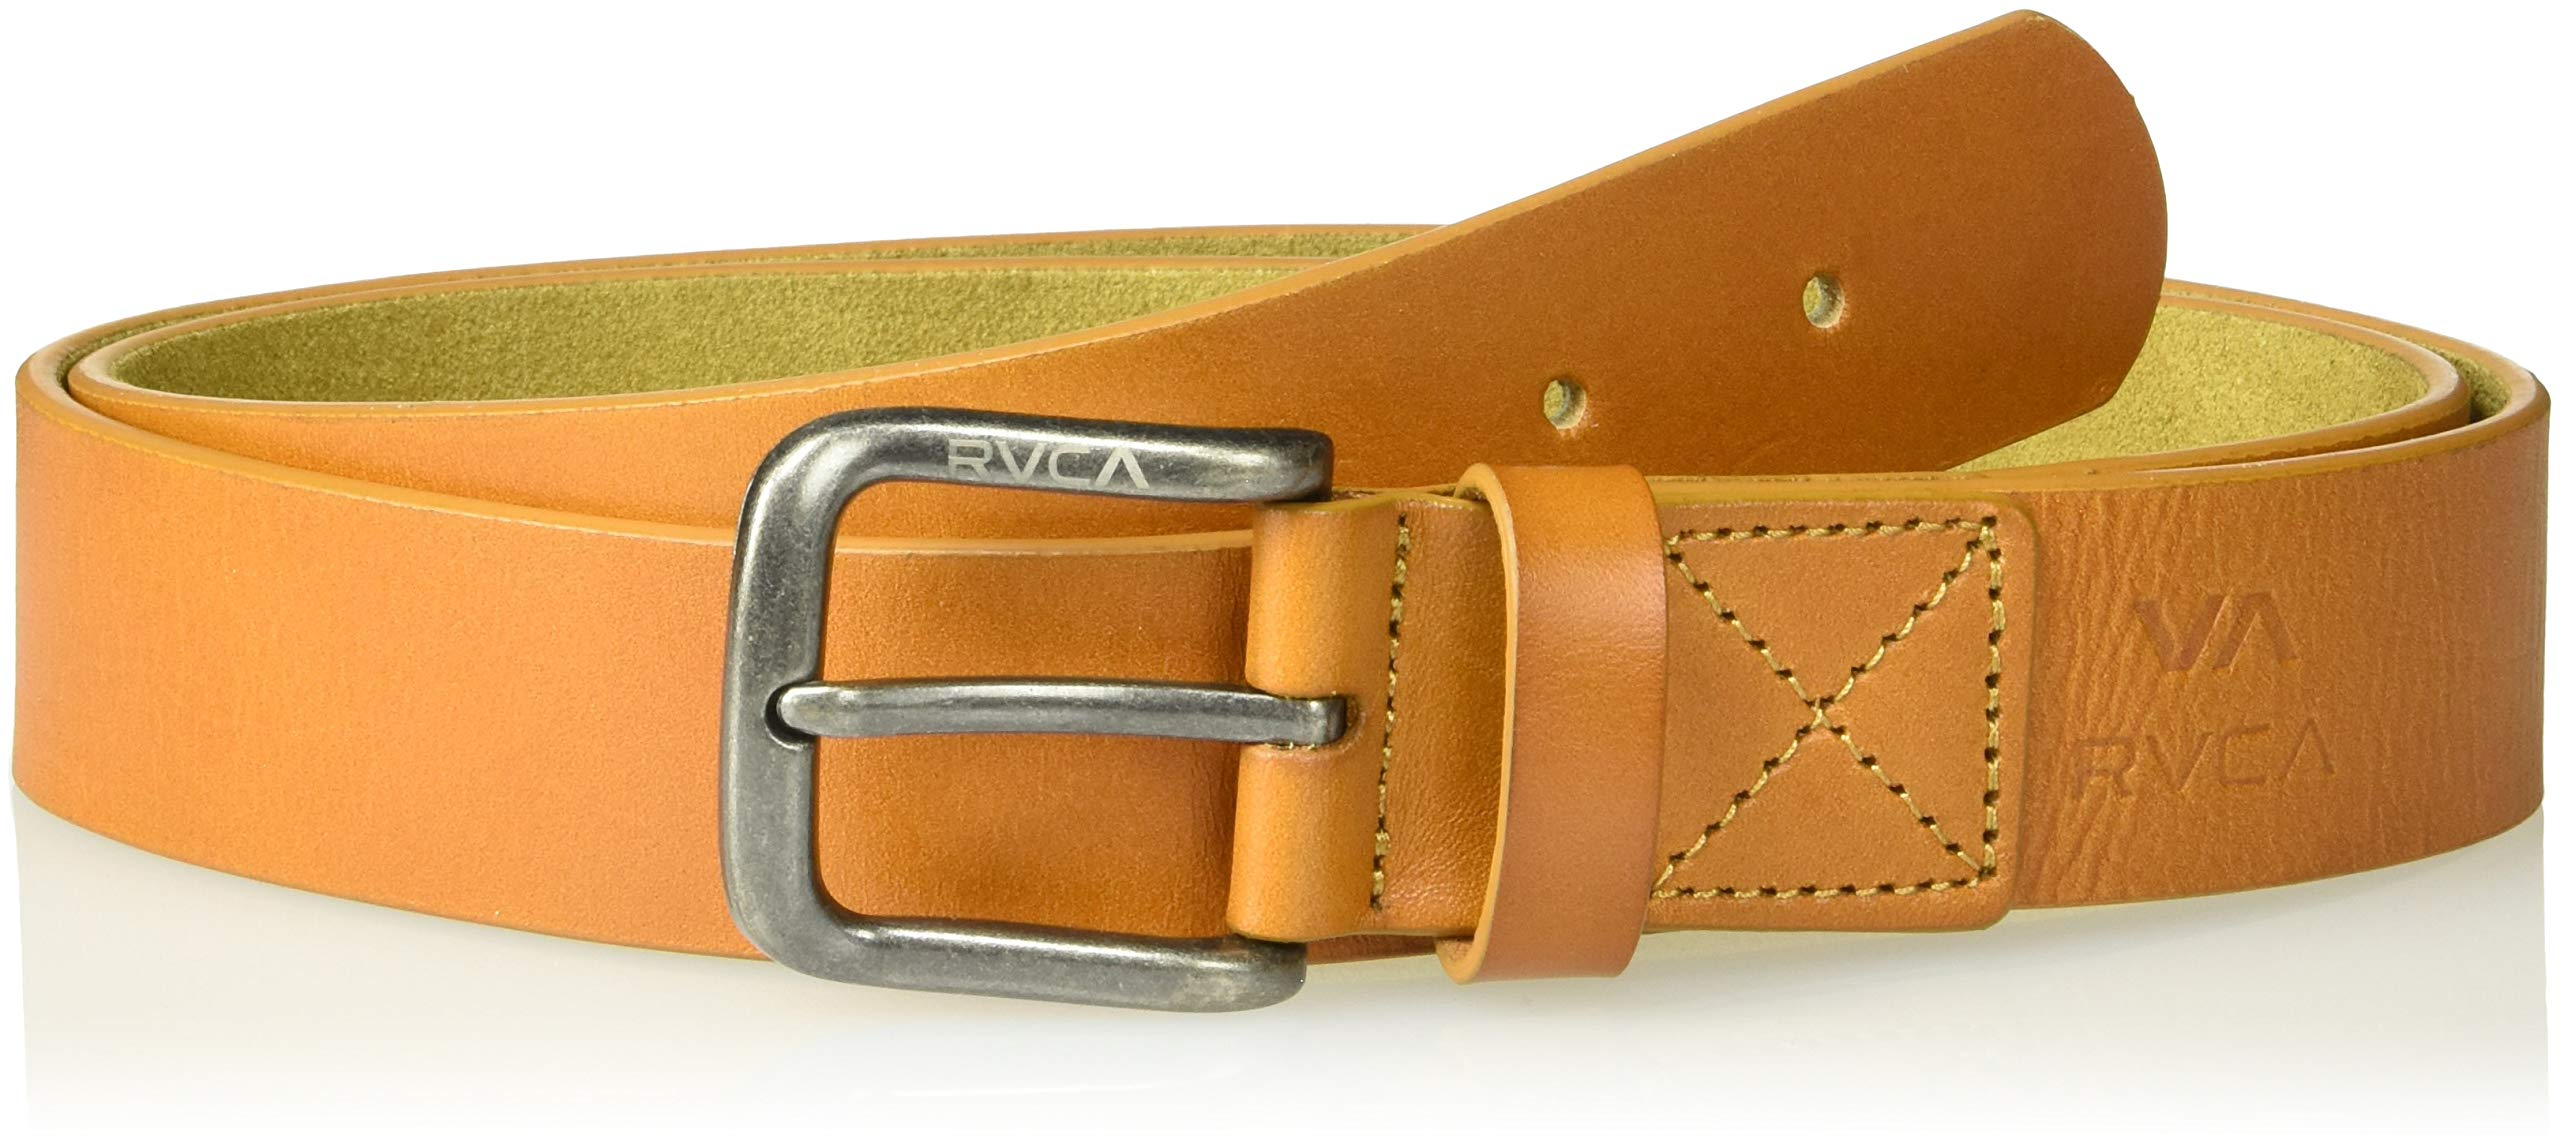 RVCA Men's TRUCE Leather Belt, tan, S/M